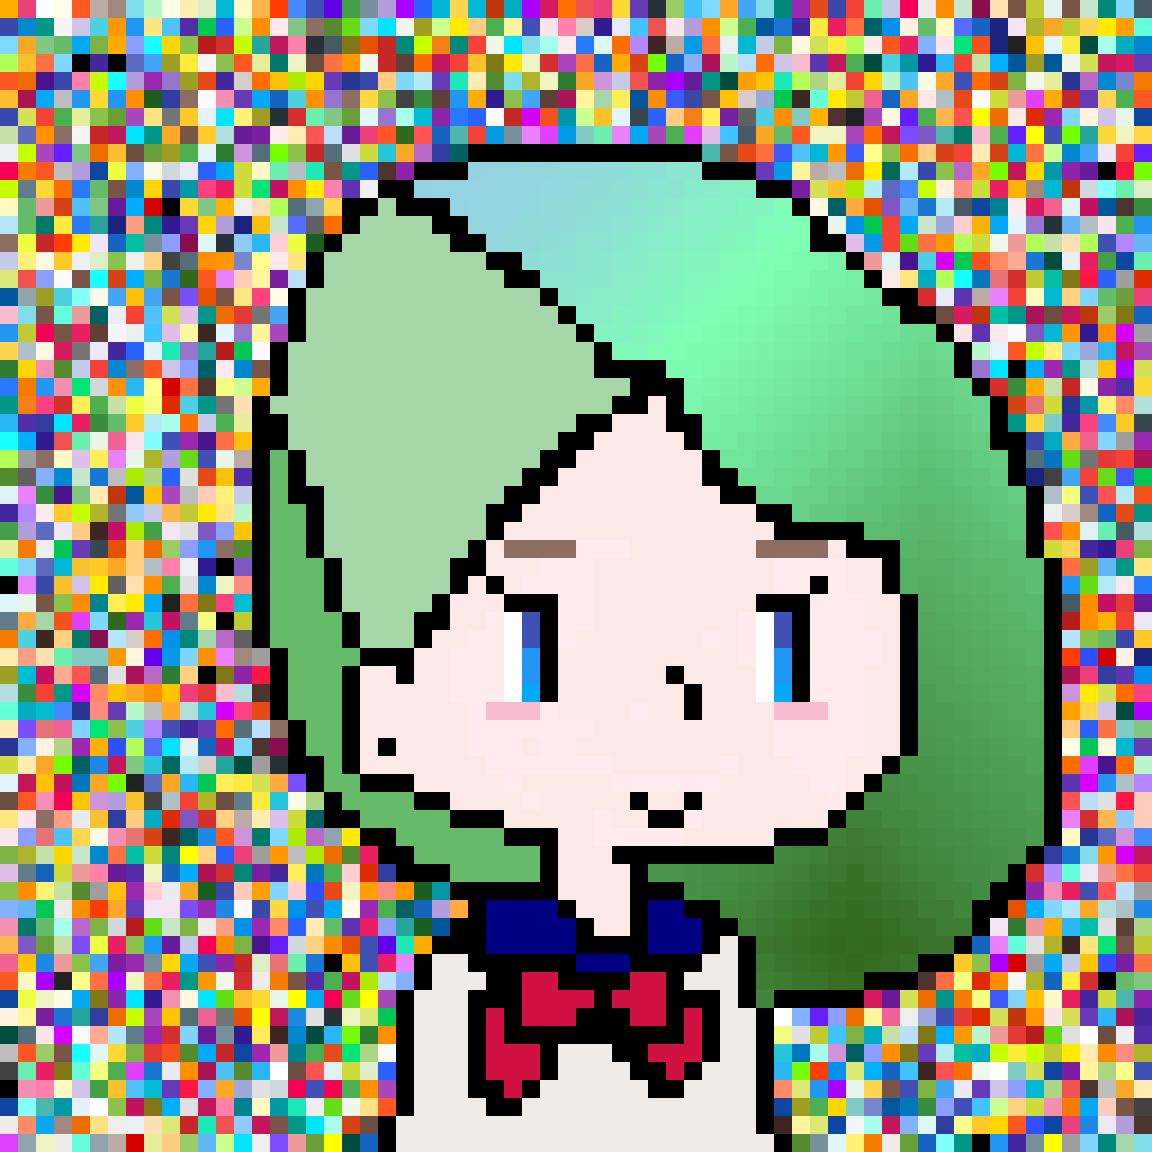 Green Hair by OctoBean